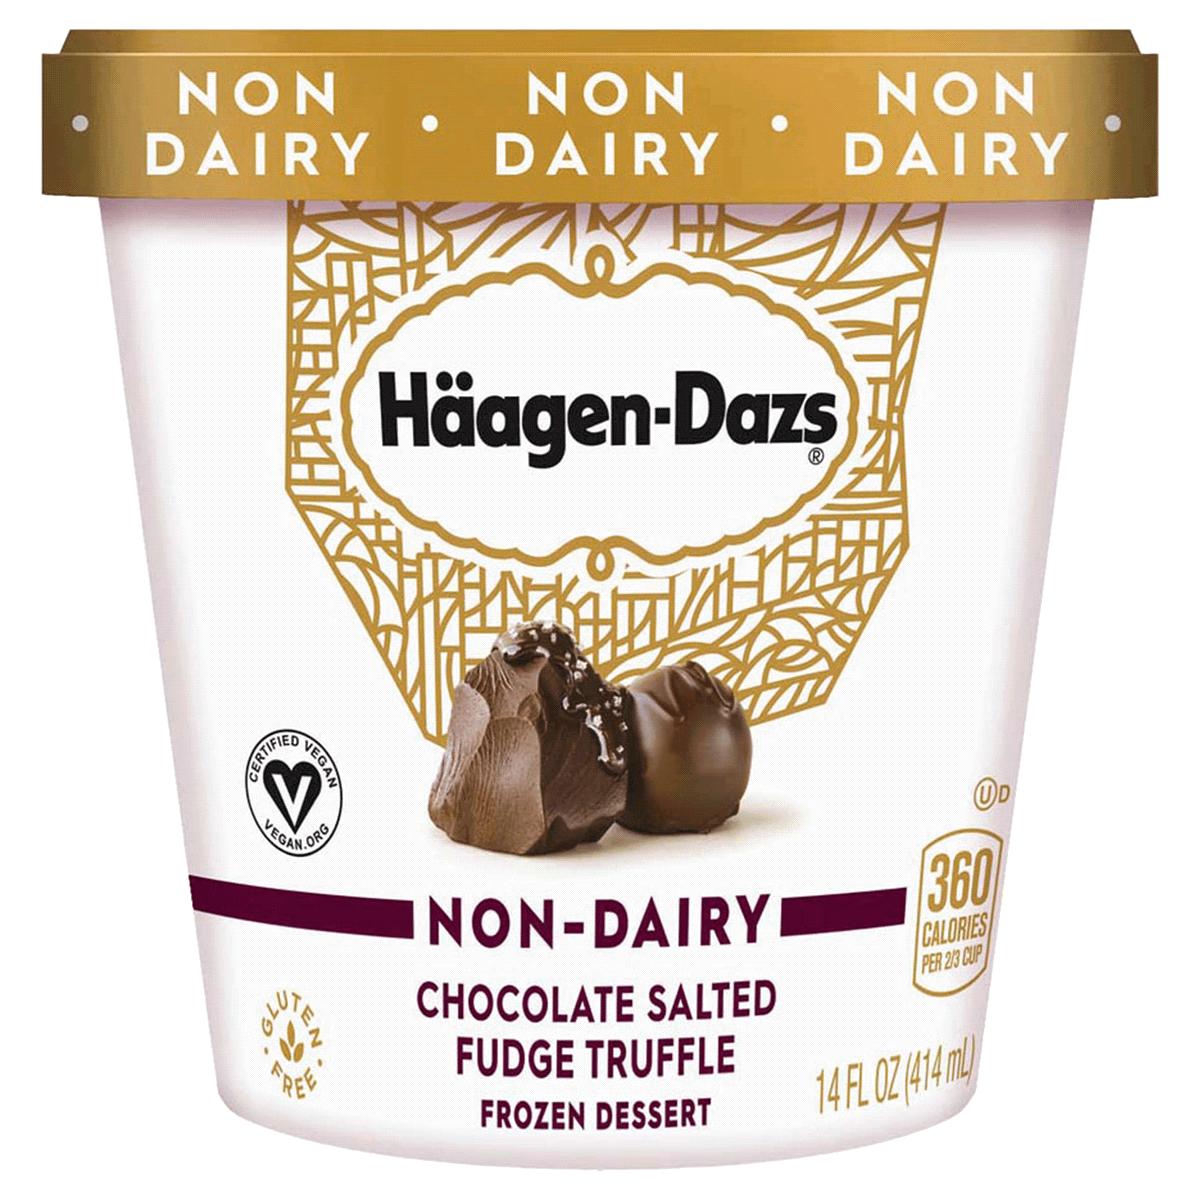 haagen-dazs nondairy chocolate salted fudge truffle